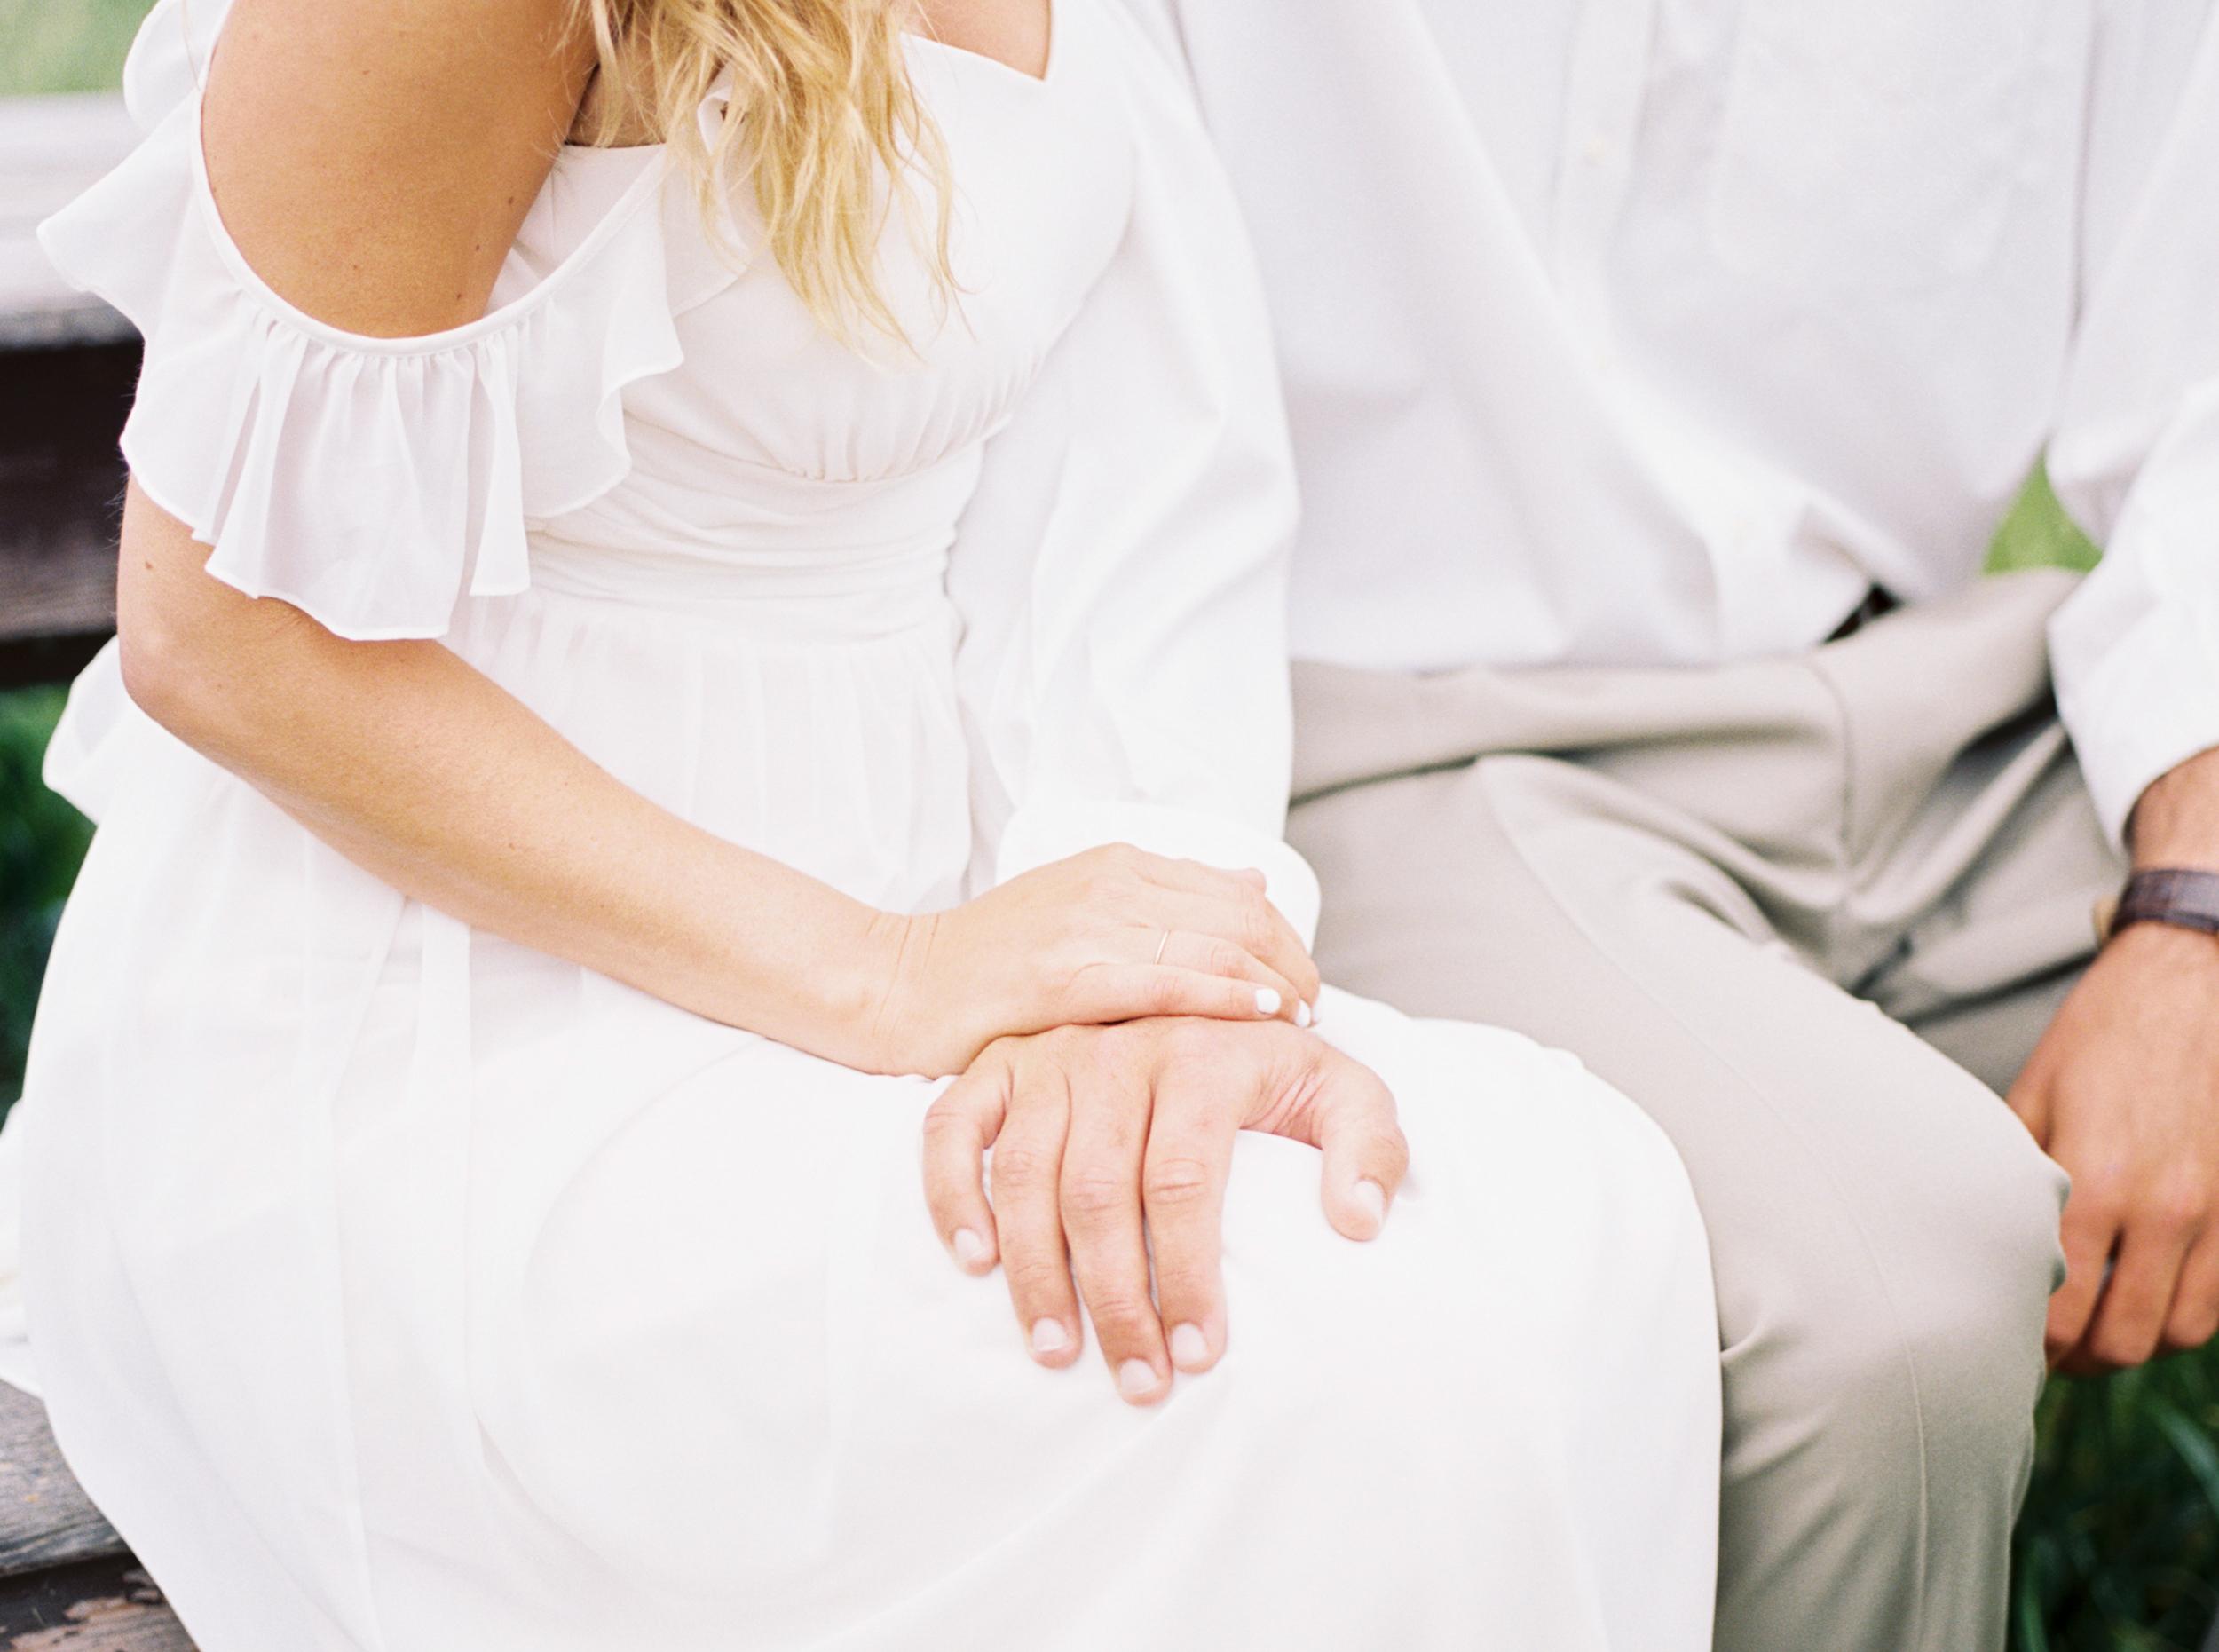 Danford-Photography-Bozeman-Montana-California-Wedding-Engagement-Photographer-41.jpg